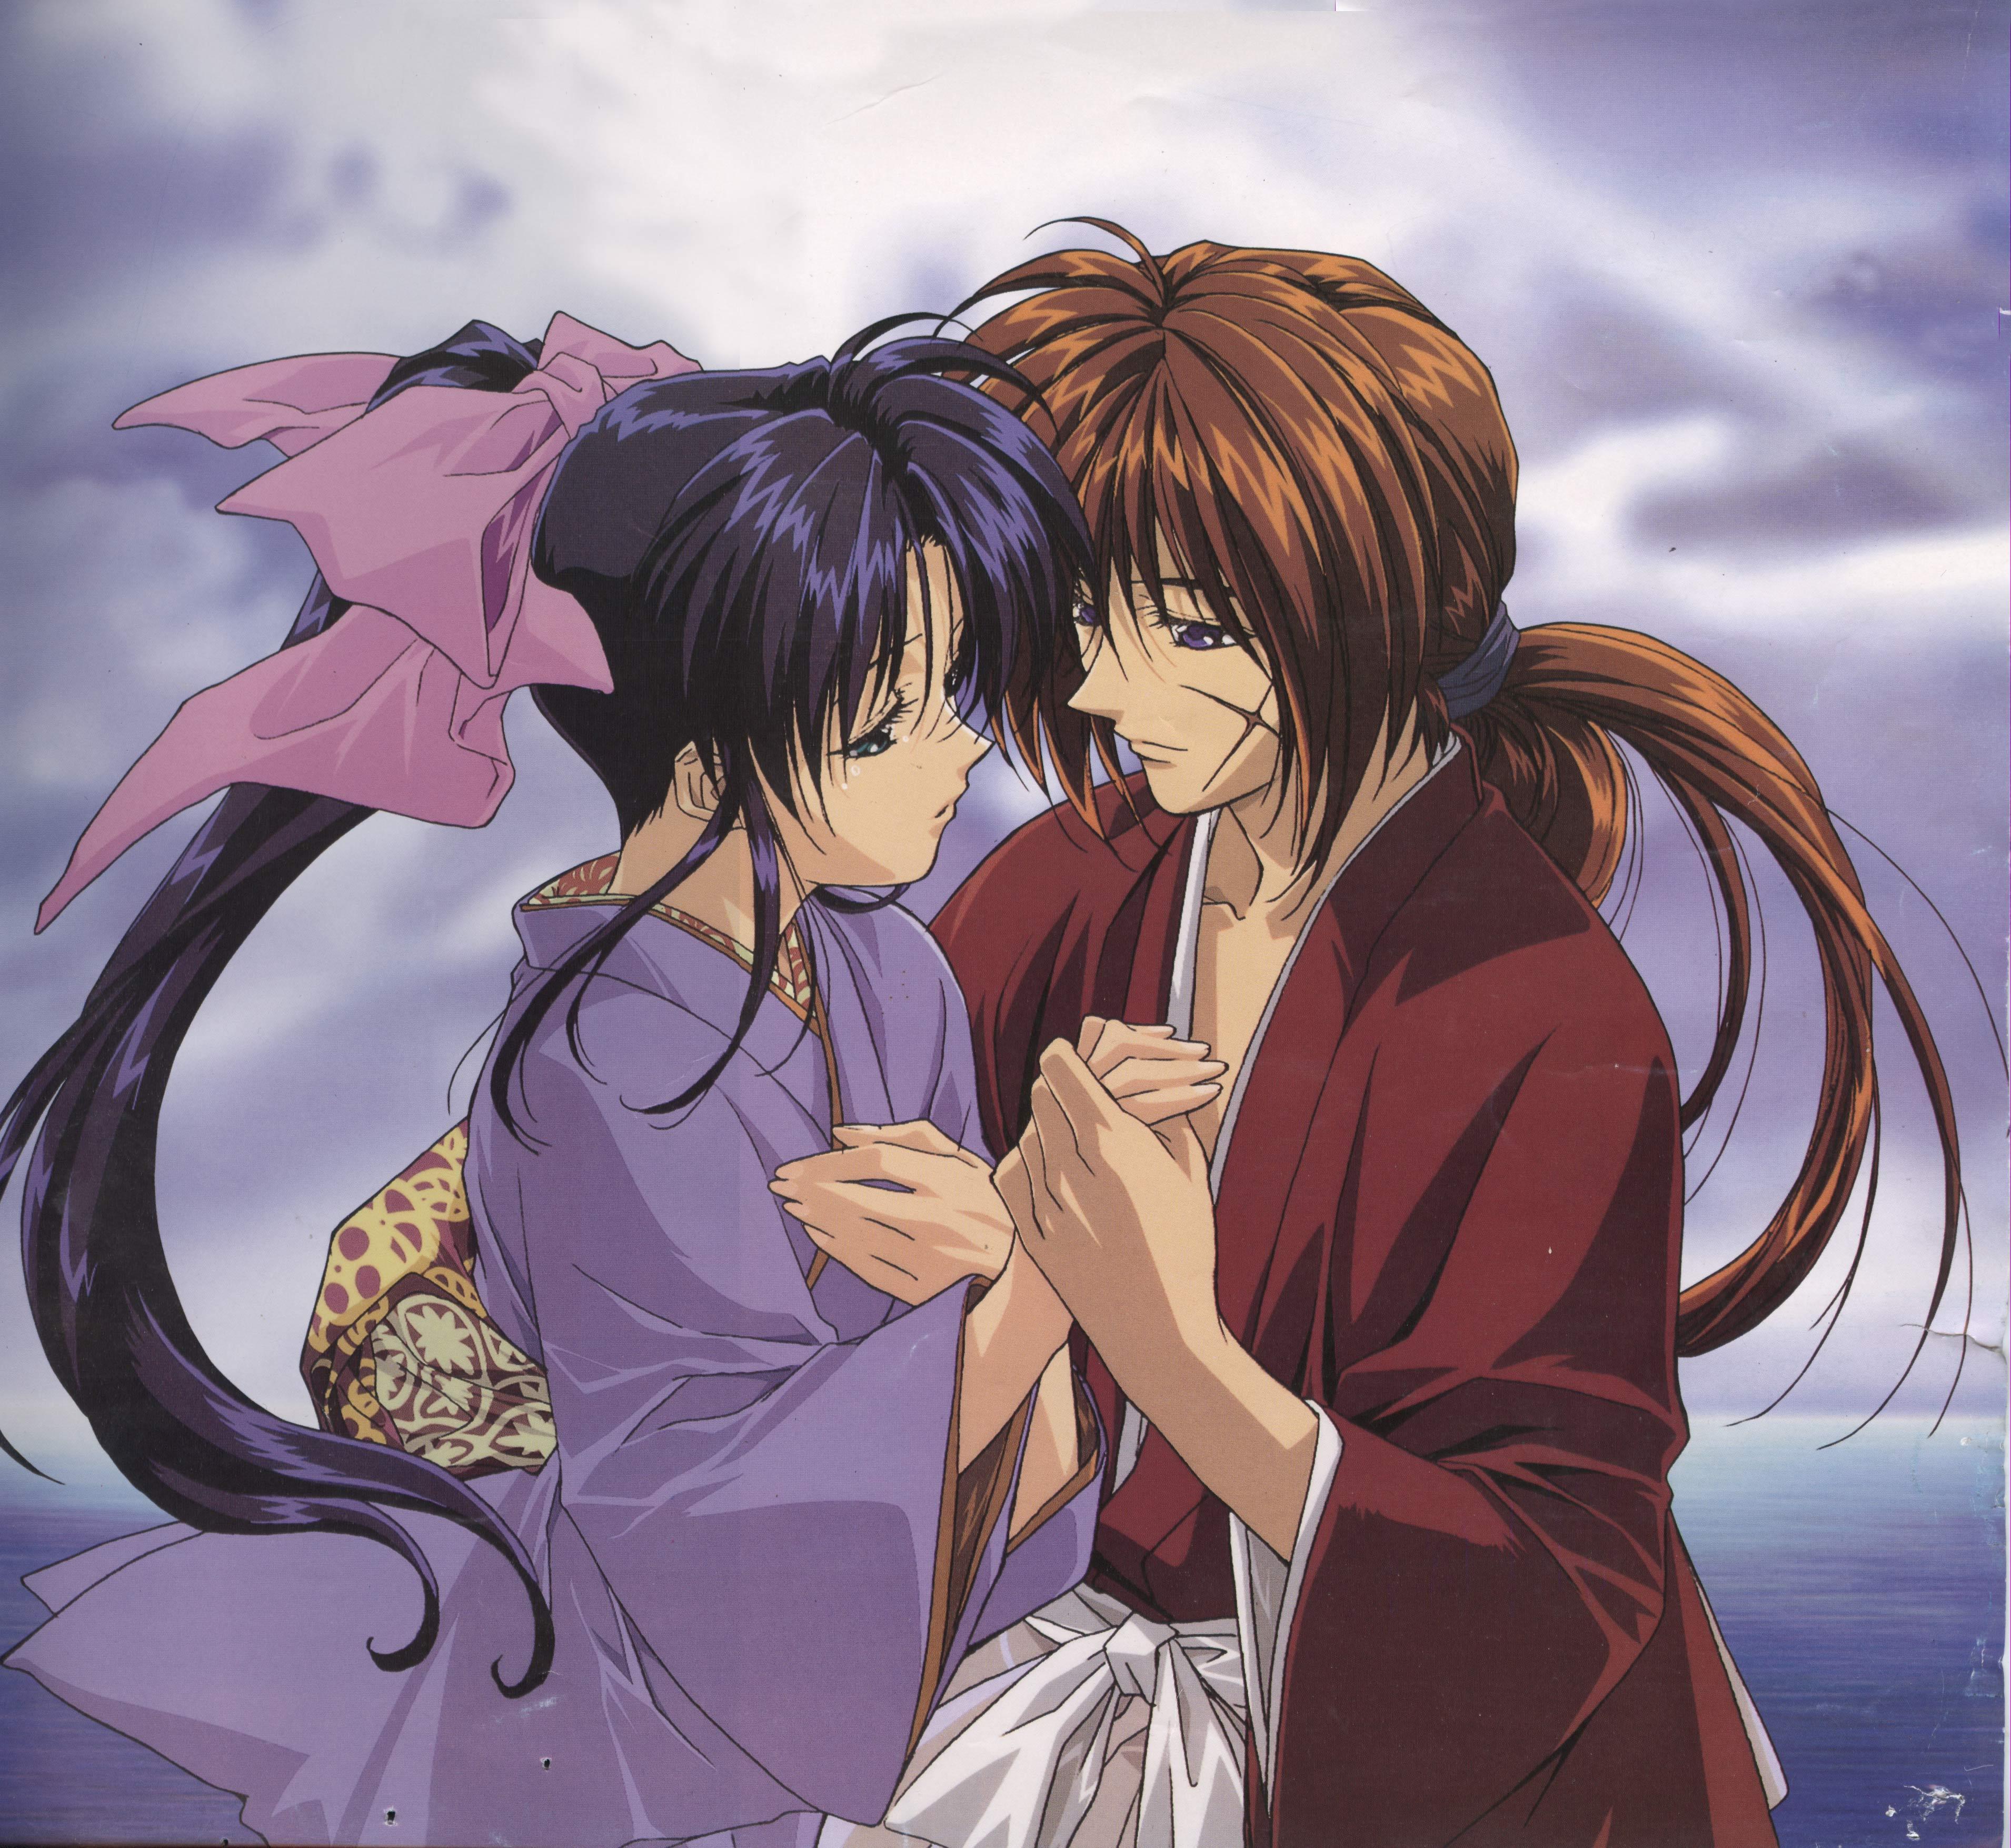 Rurouni Kenshin (Meiji Swordsman Romantic Story